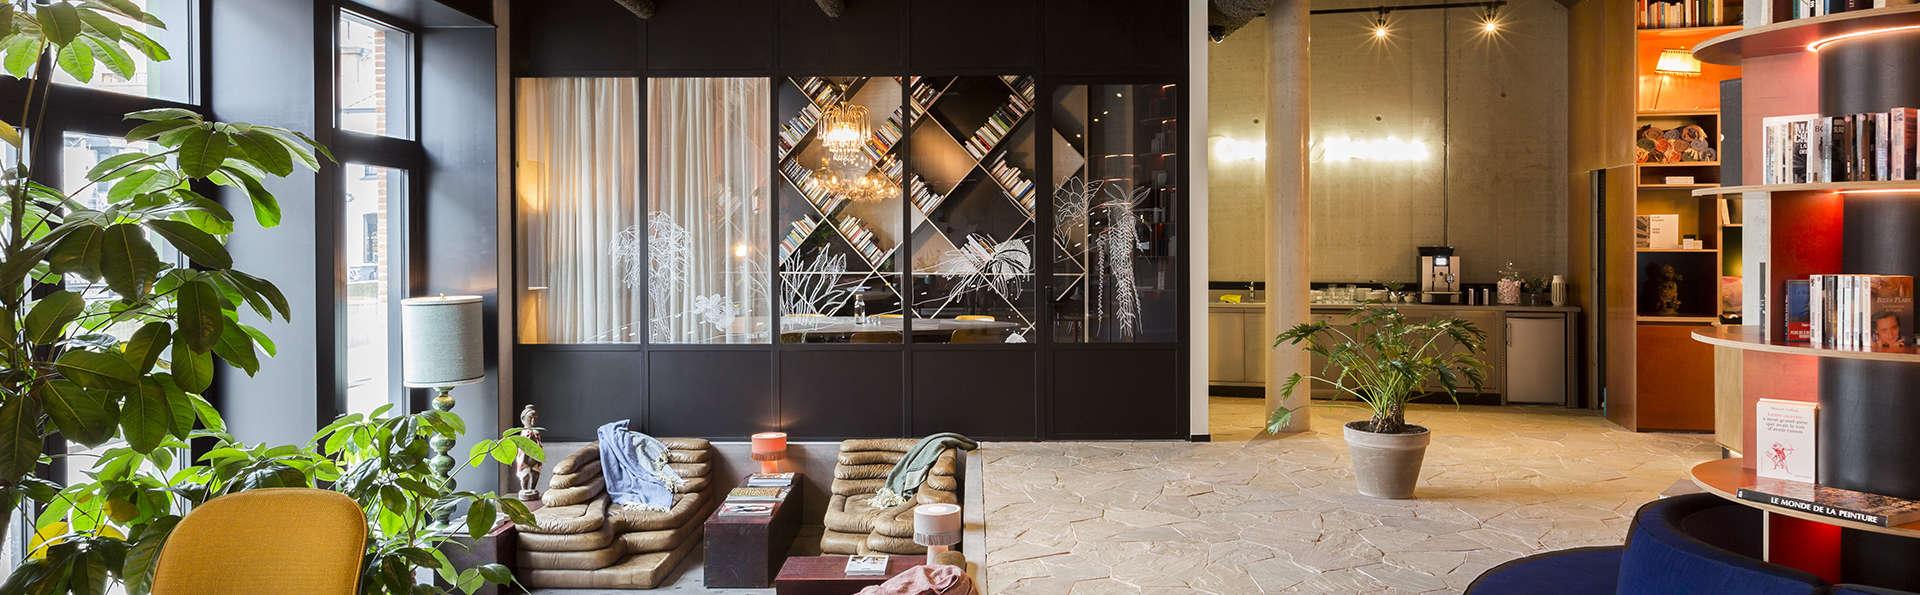 YUST Hotel Antwerp - EDIT_YUST_Antwerp_Lobby_01_Main.jpg